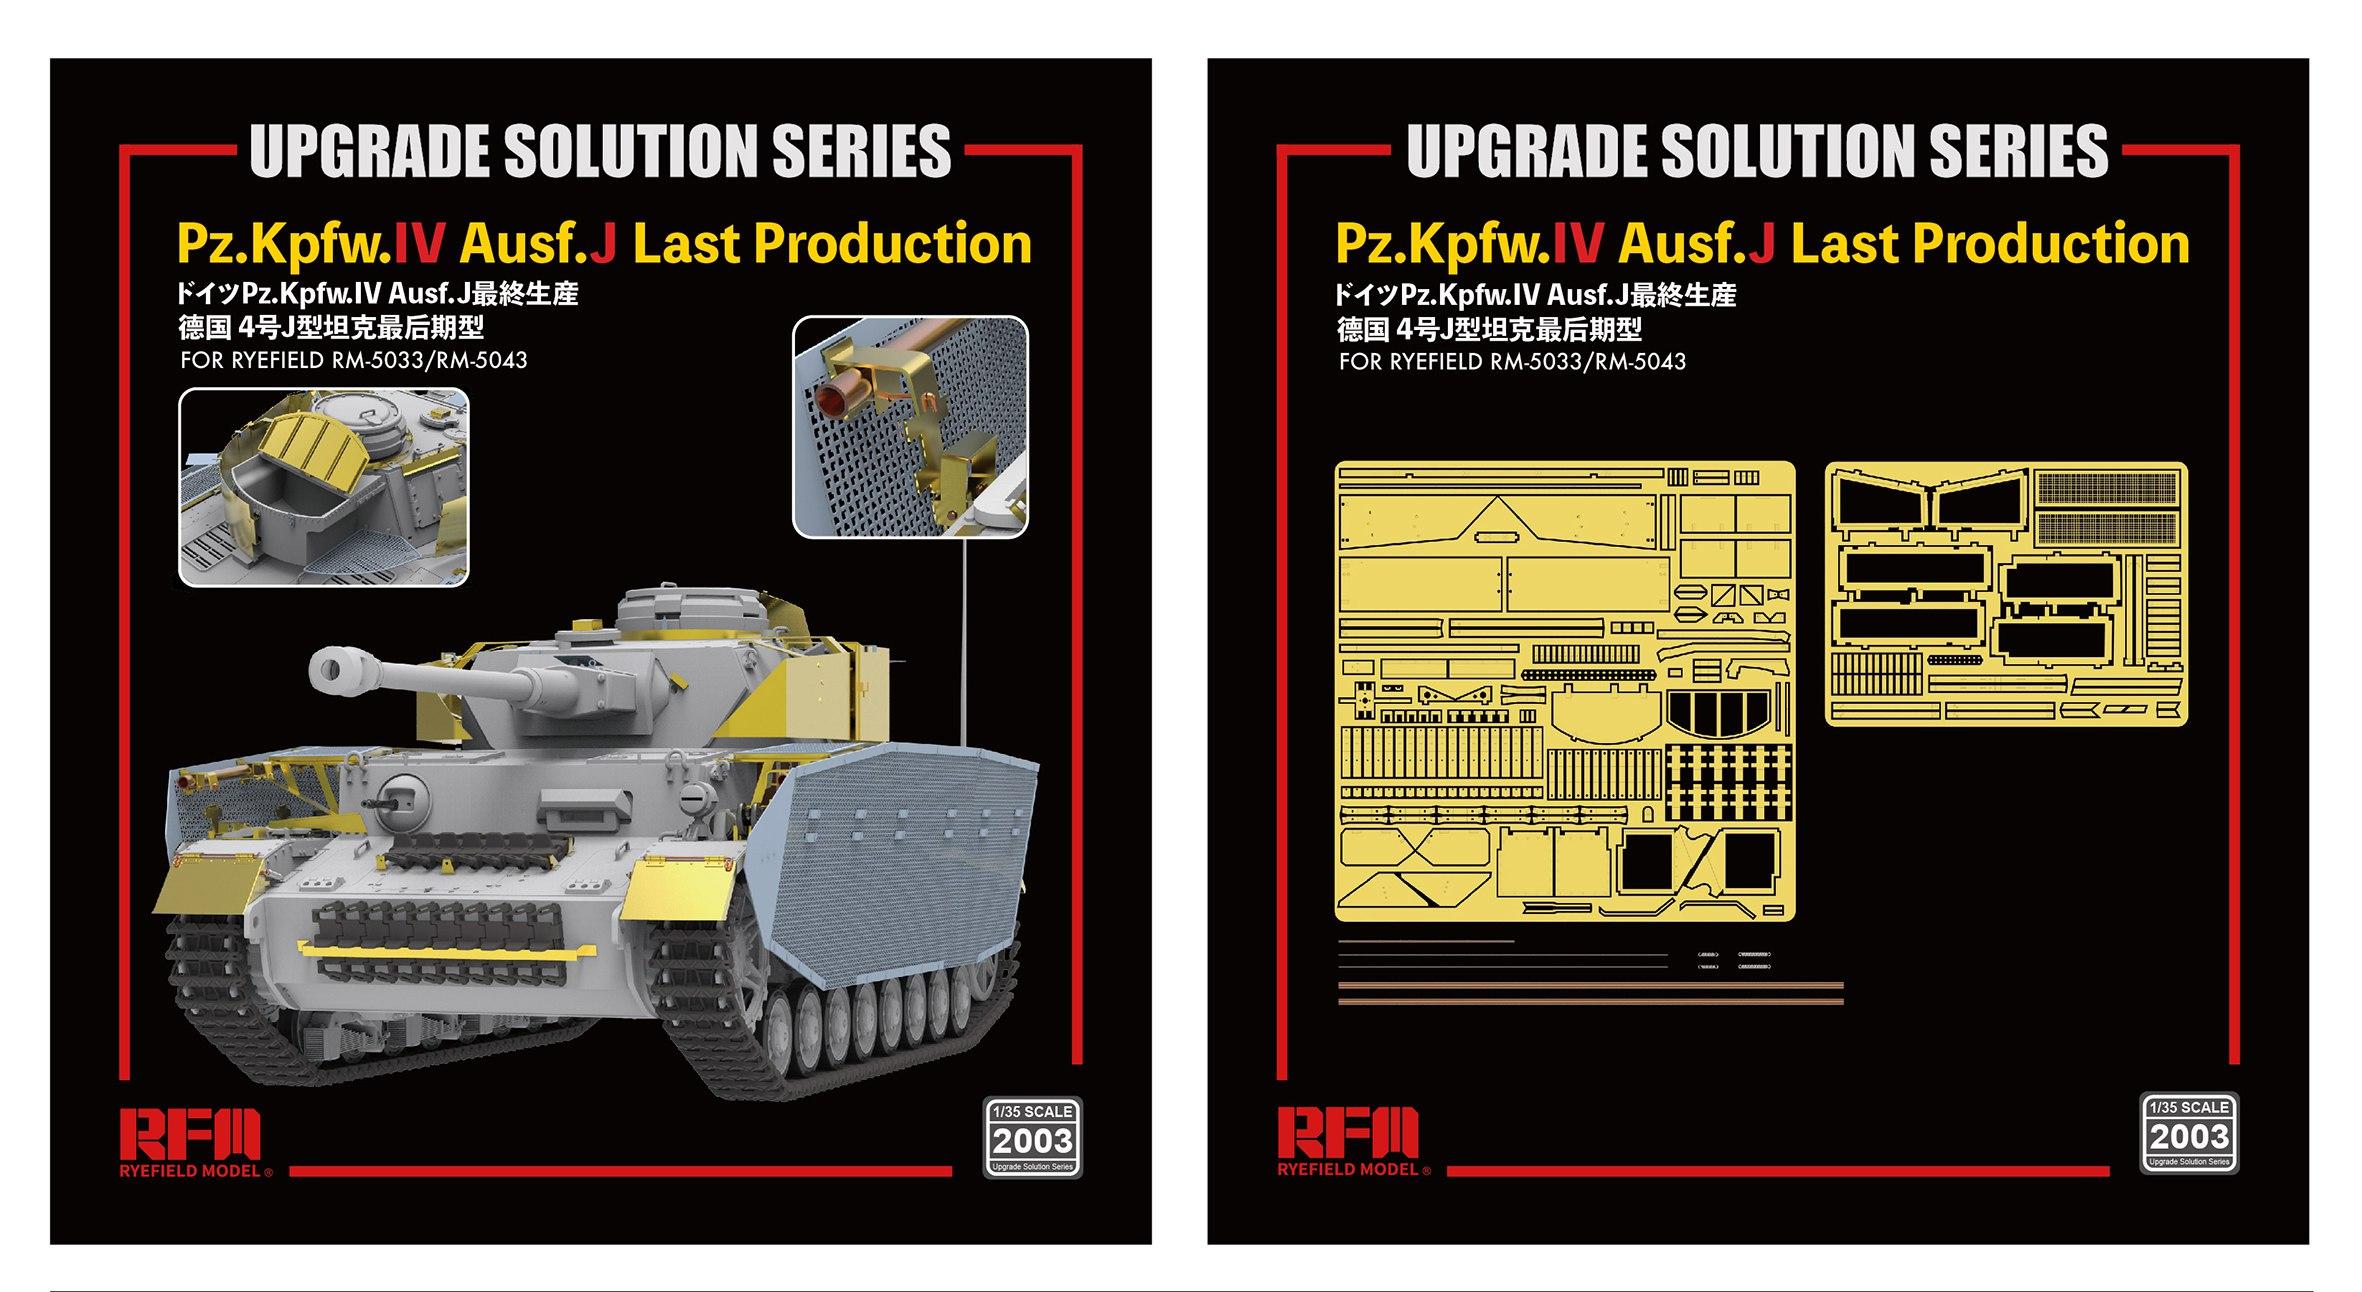 RM-2003 Pz.Kpfw.IV Ausf.J Last Production UPGRADE SOLUTION SERIES